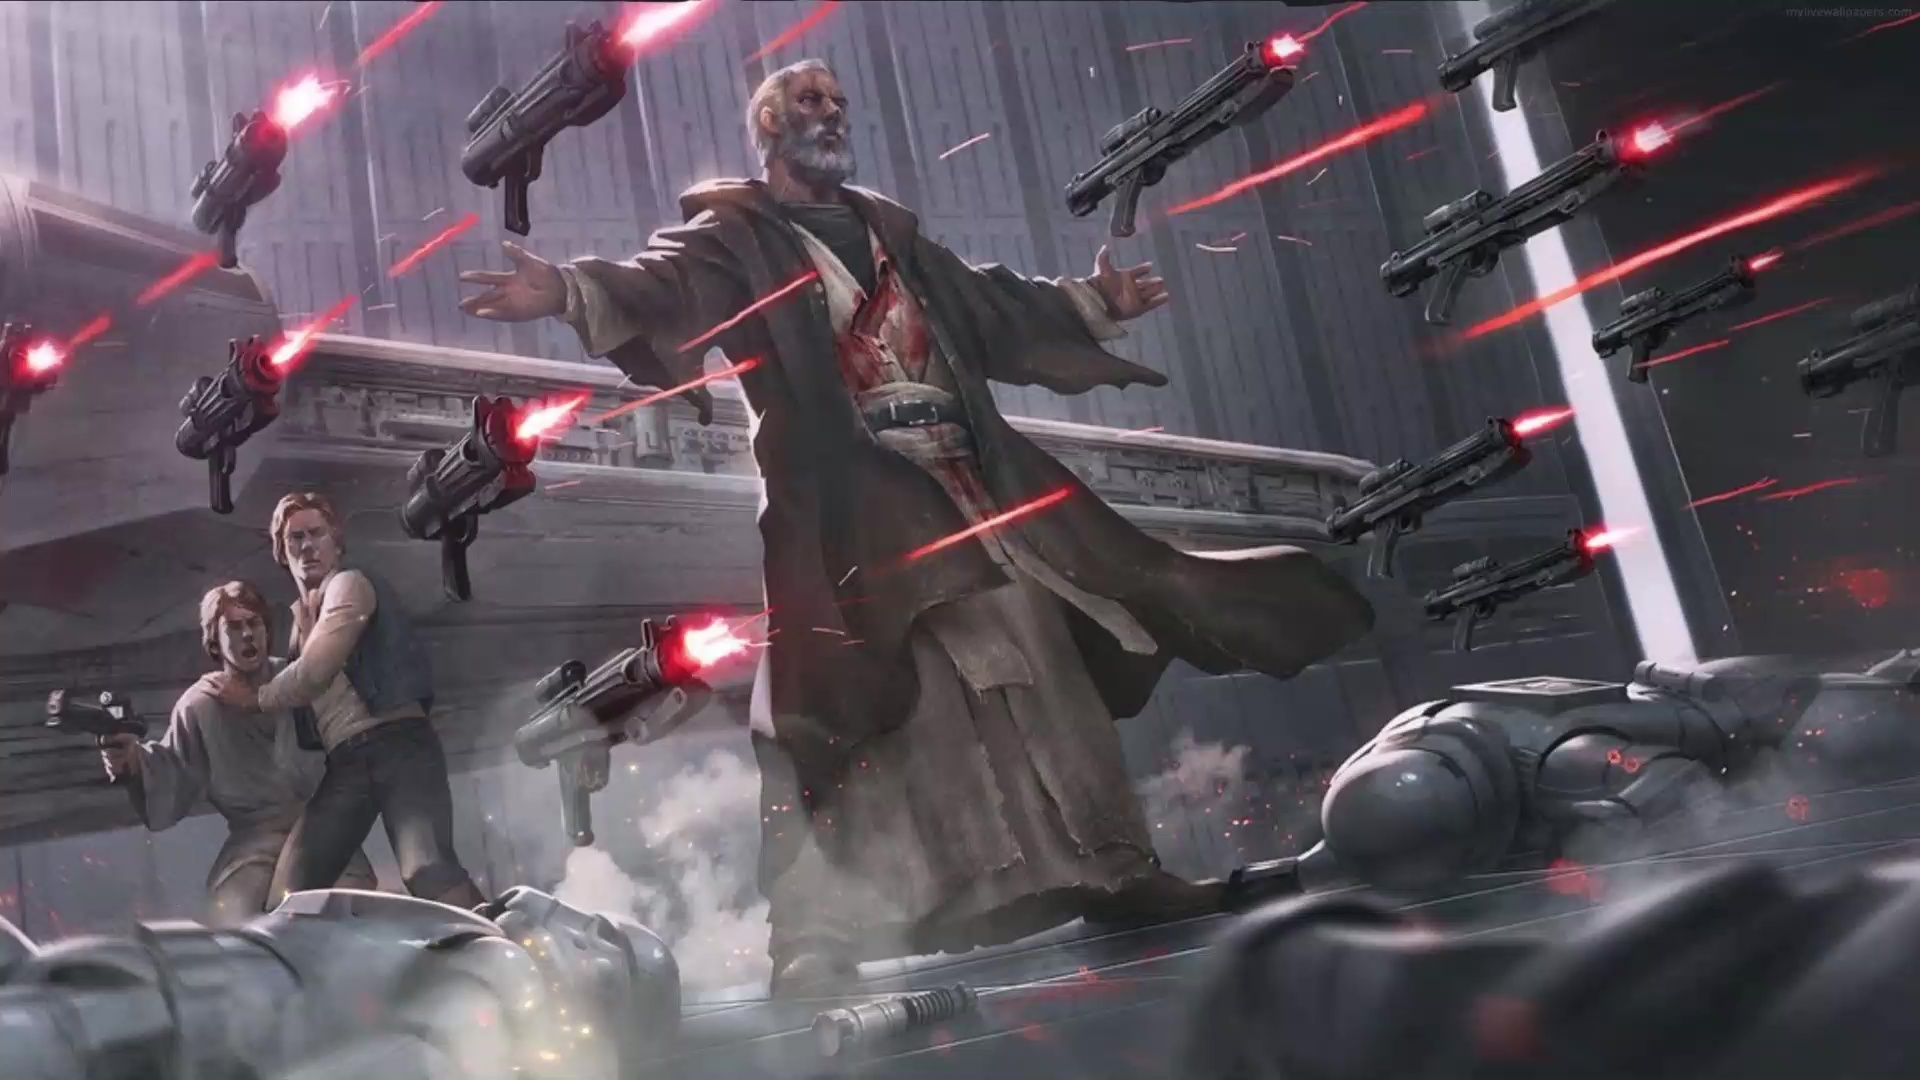 Obi Wan Kenobi The Force Star Wars Live Wallpaper Wallpaperwaifu